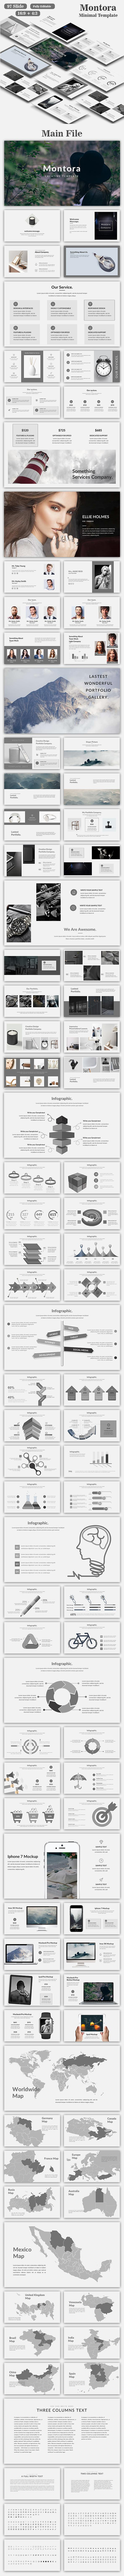 Montora Minimal PowerPoint Template - Creative PowerPoint Templates